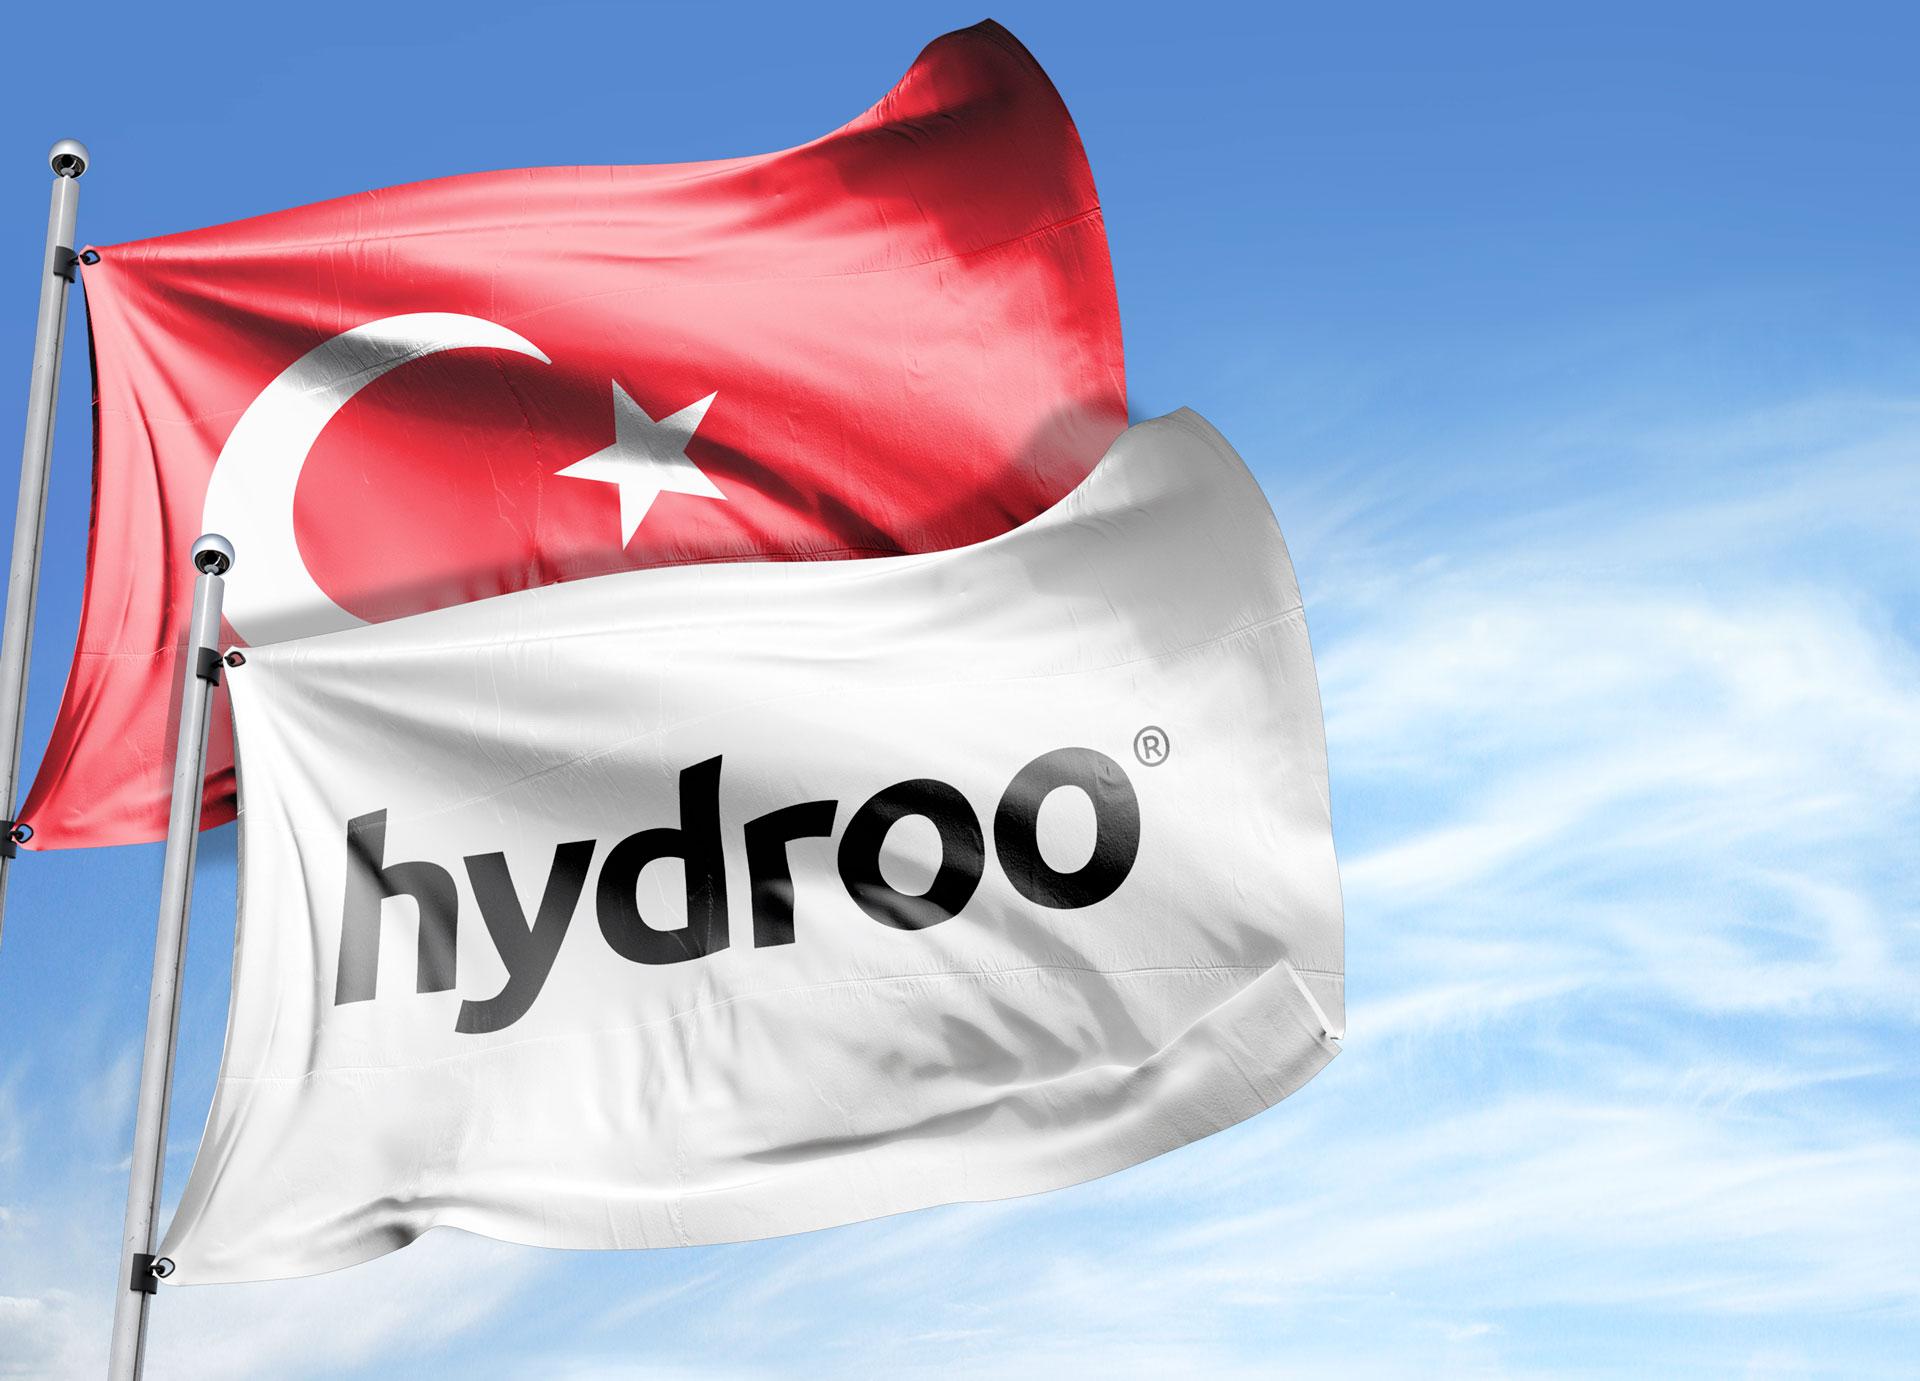 hydroo-turkiye-